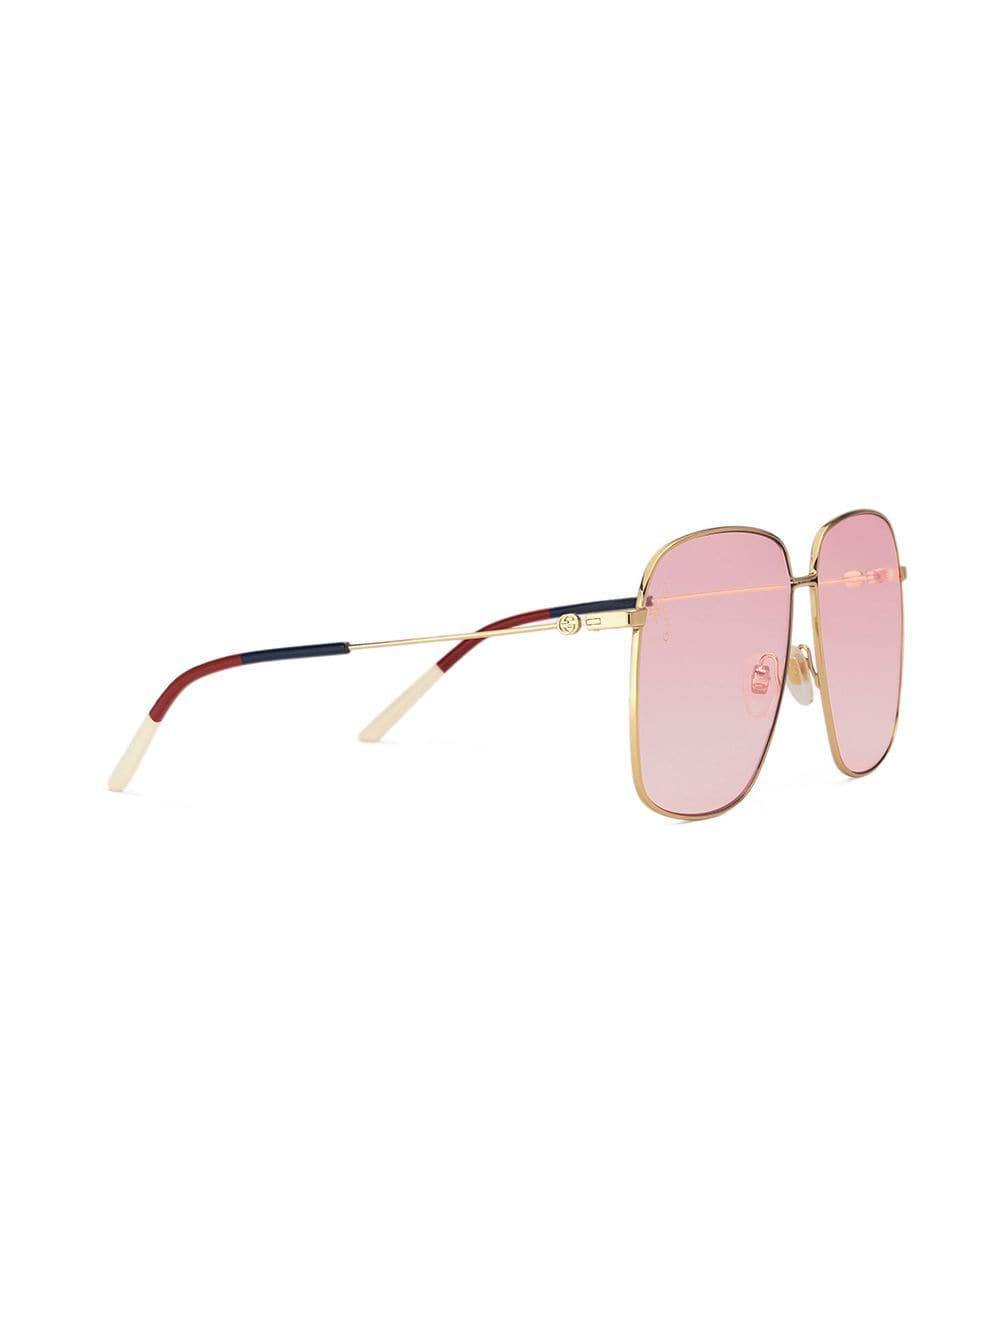 a7ccf4bd3a7 Gucci - Metallic Oversized Square-frame Sunglasses - Lyst. View fullscreen